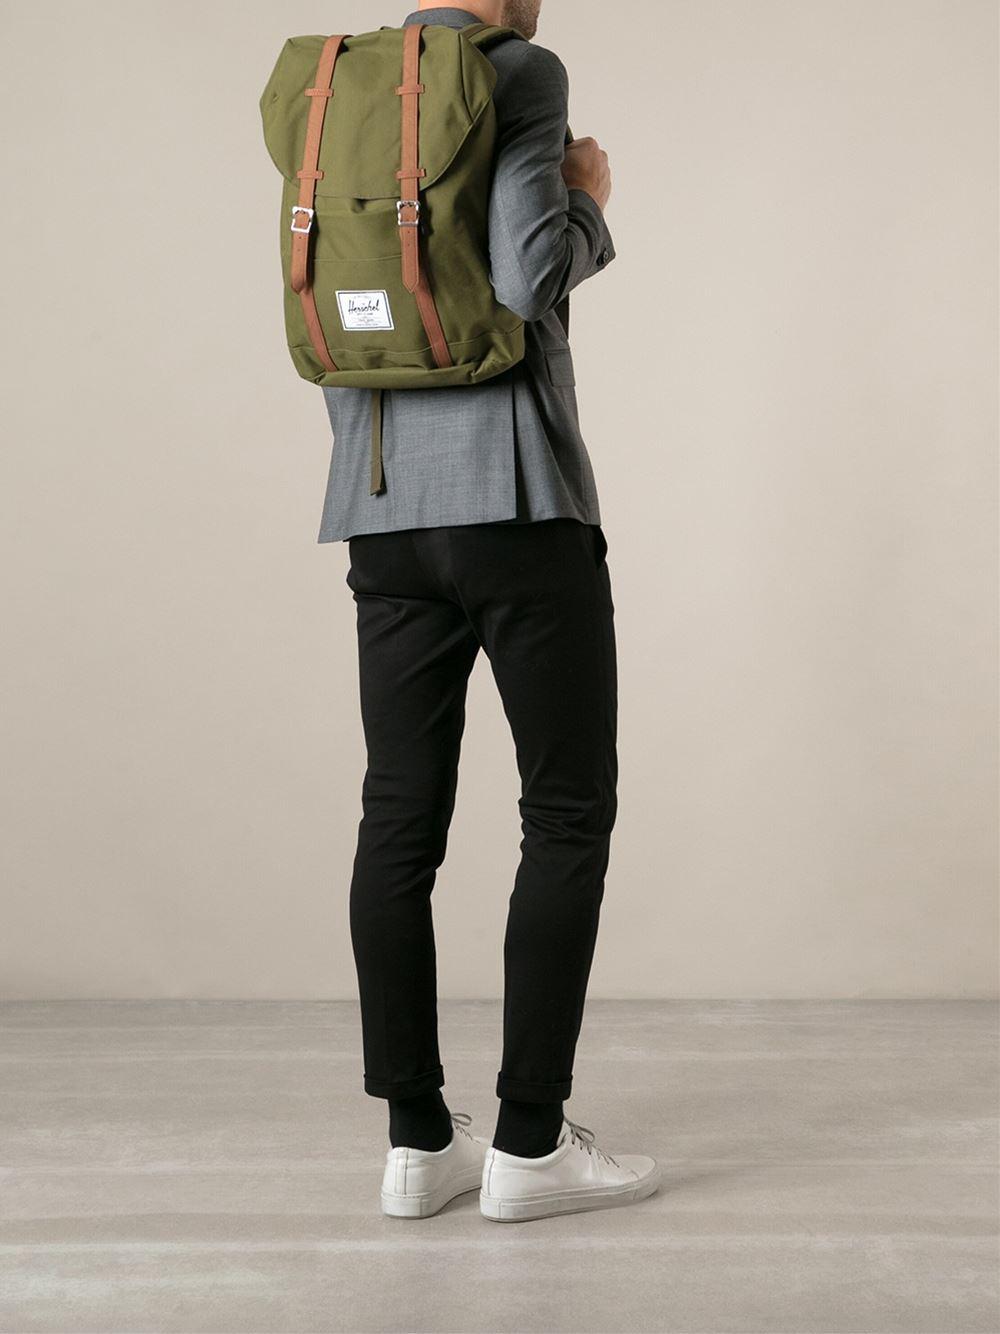 Lyst - Herschel Supply Co. Mid-volume Little America Backpack in ... 239fbe8f8c4da